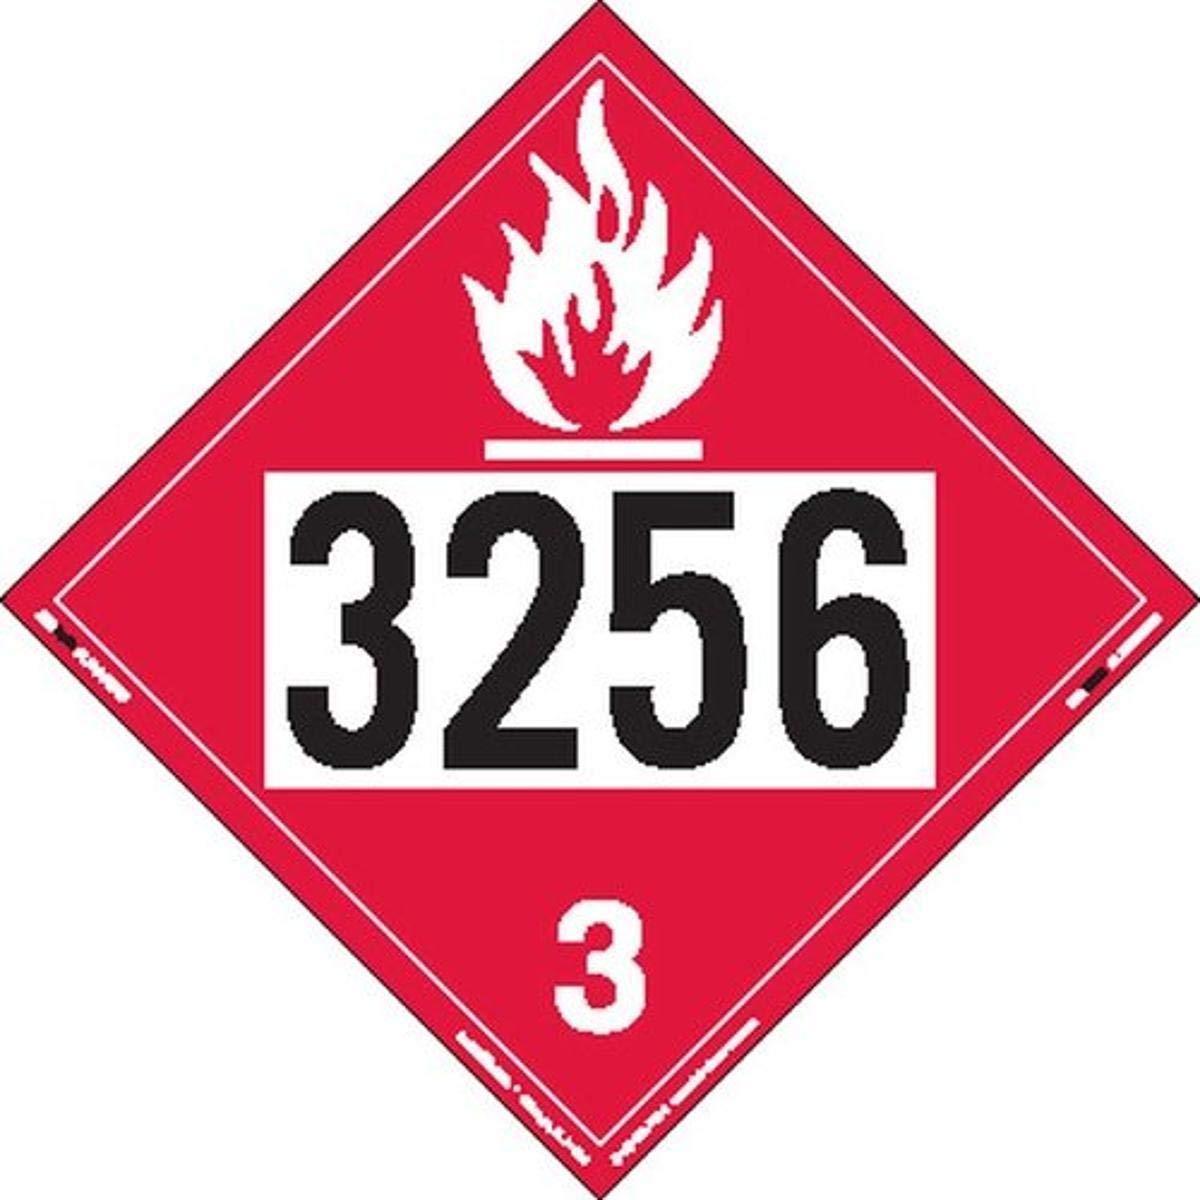 Labelmaster ZT2-3256 UN 35% OFF 3256 Max 72% OFF Flammable Ta Hazmat Placard Liquid